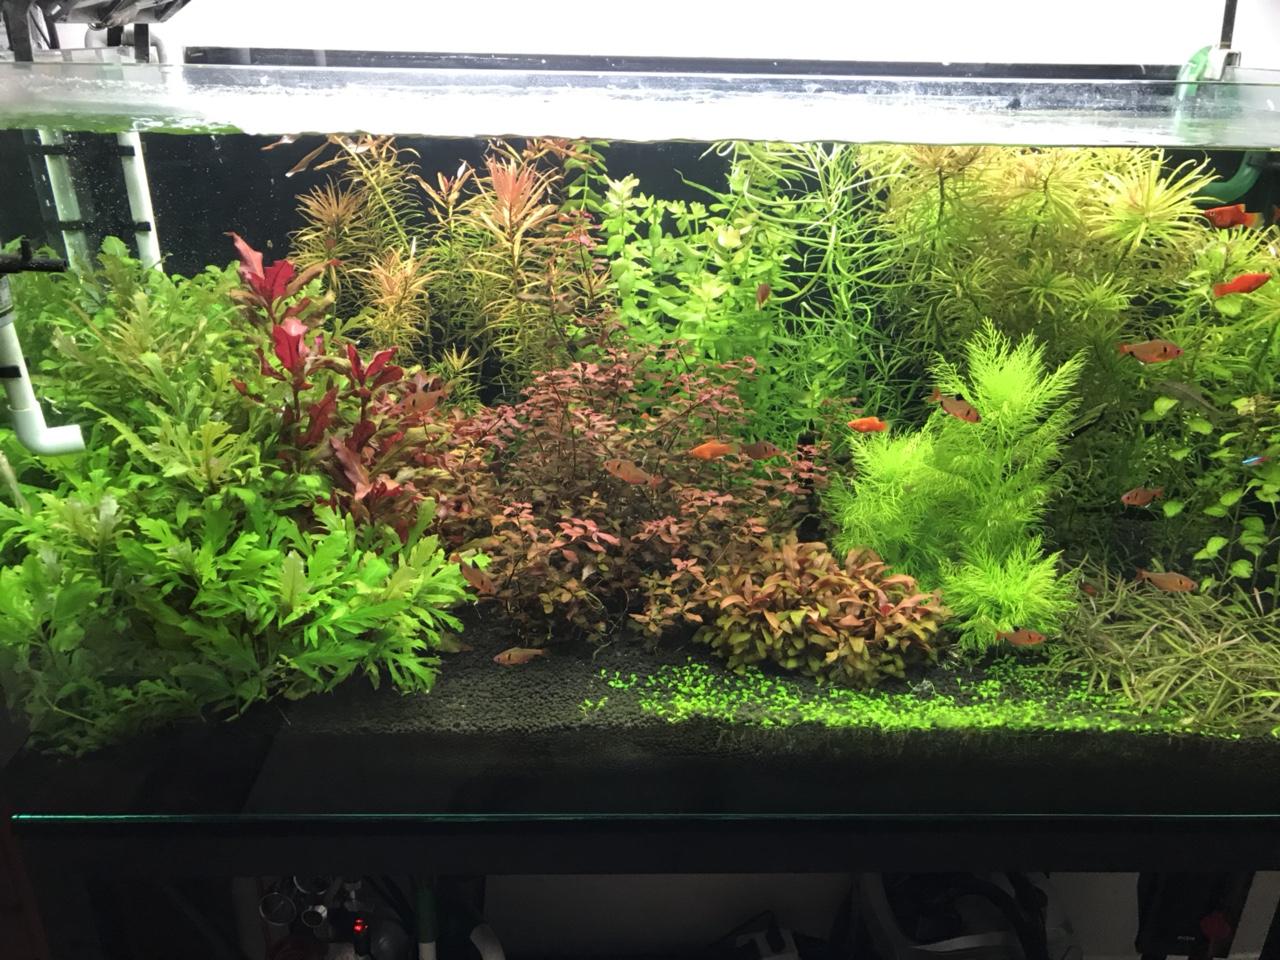 hồ thủy sinh cập nhật 13-06-2018